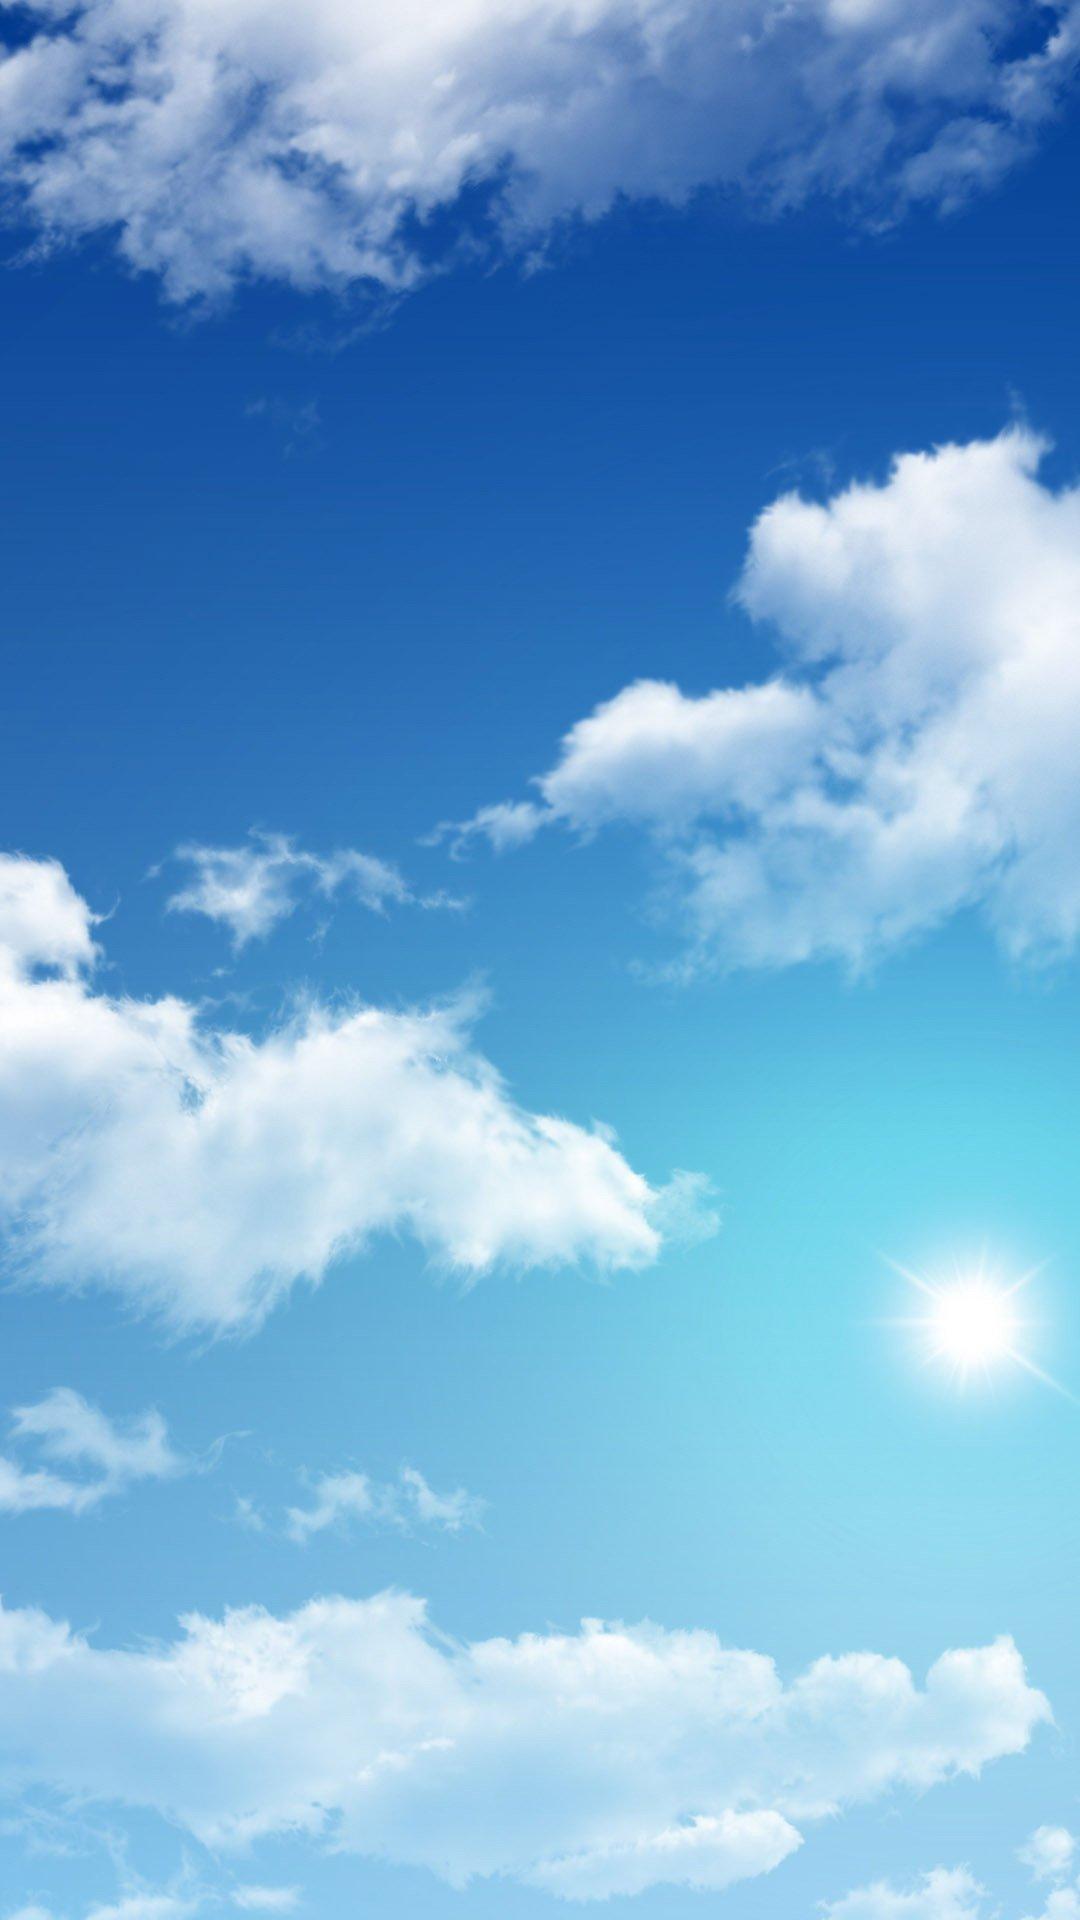 Sunny sky Wallpaper 1080x1920